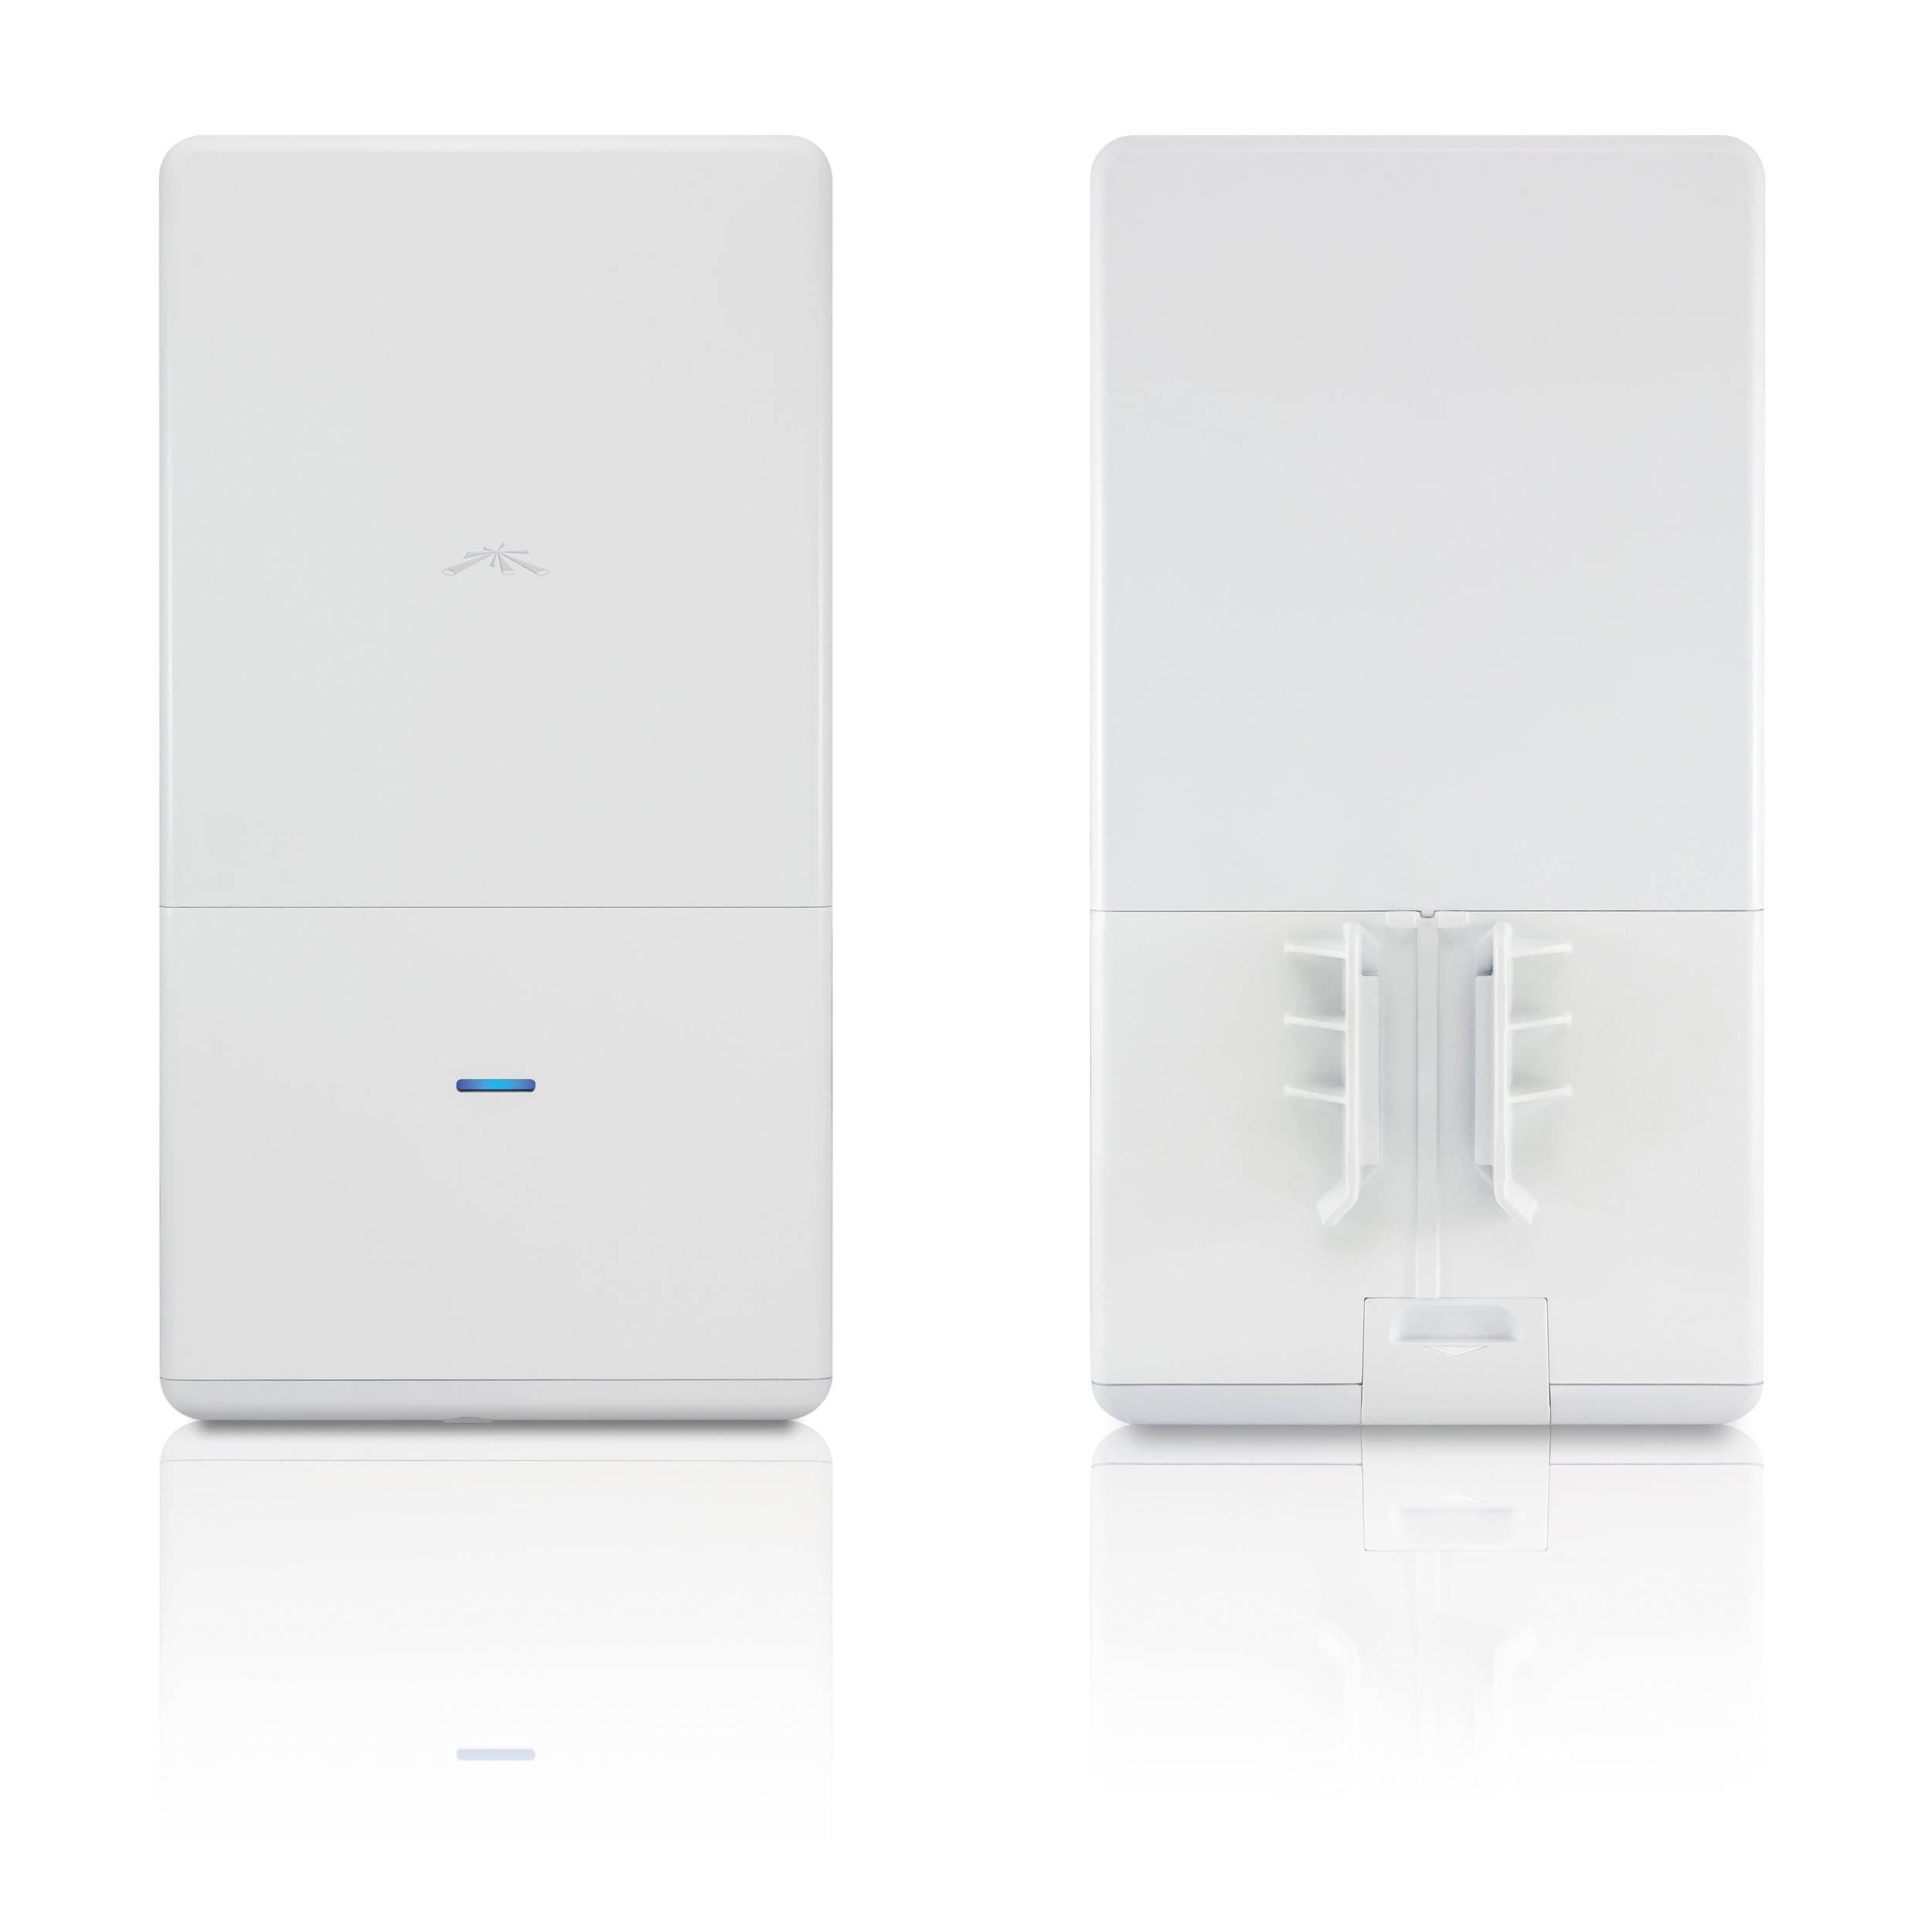 Ubiquiti Networks UAP-AC-OUTDOOR UniFi Access Point Enterprise Wi-Fi System